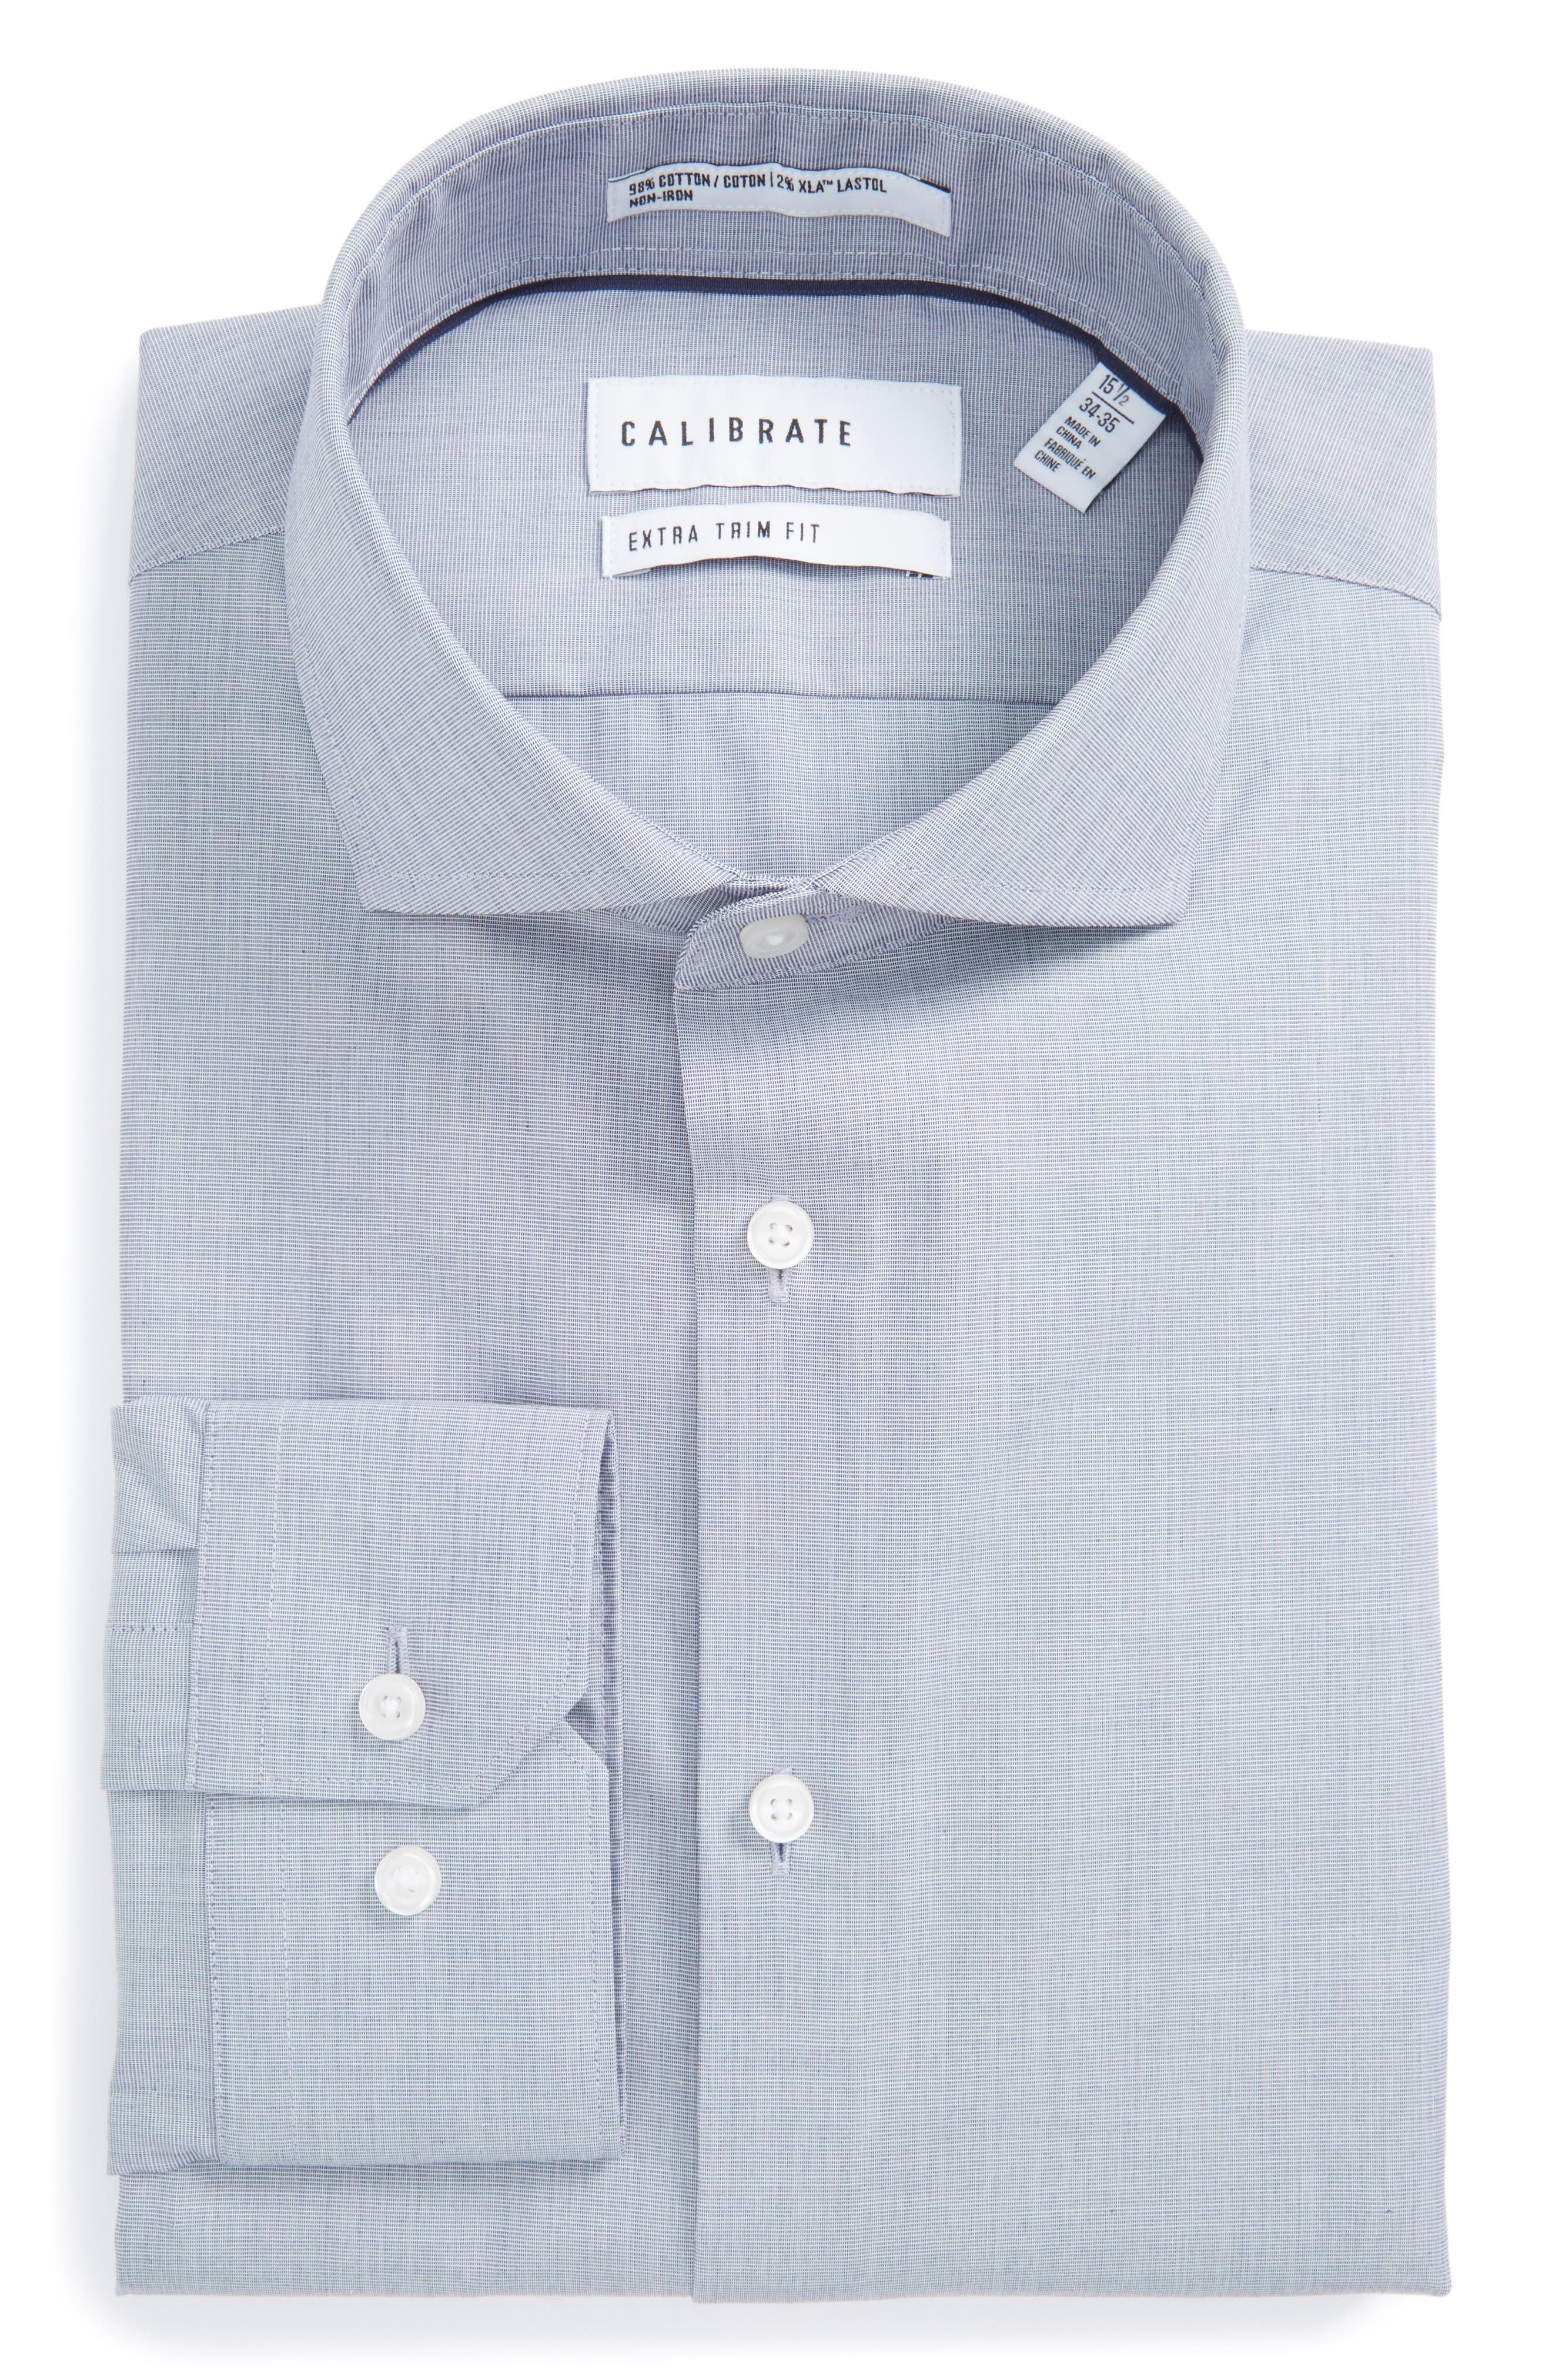 Alternate Image 1 Selected - Calibrate Extra Trim Fit Stretch No-Iron Dress Shirt